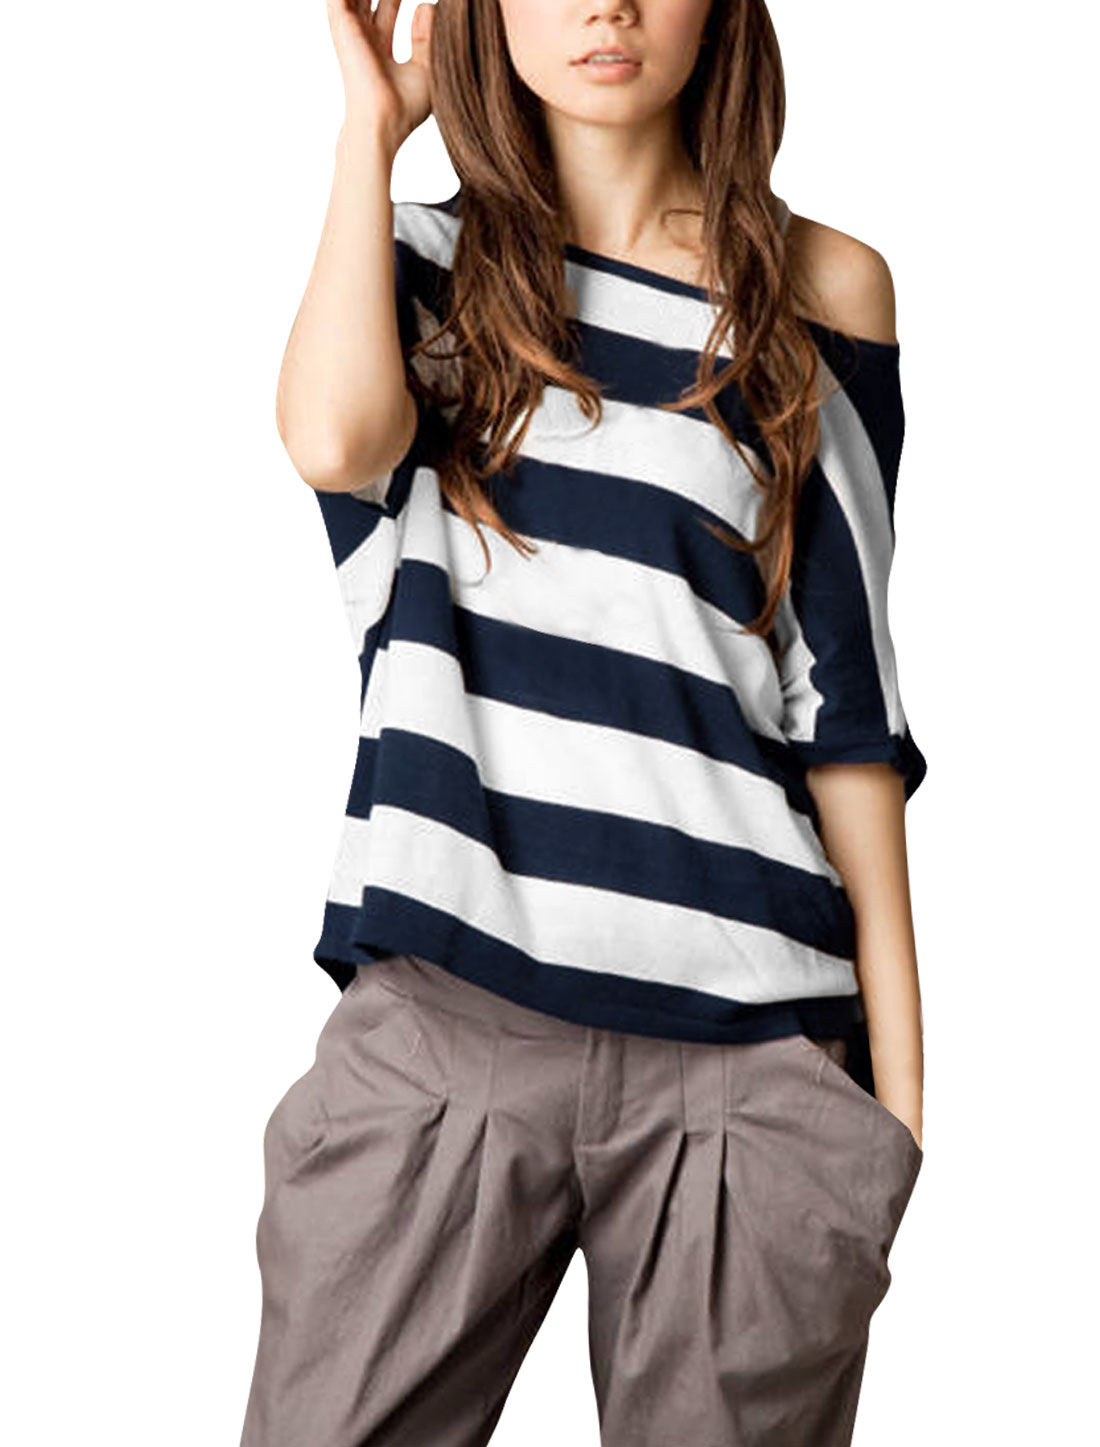 Lady Bat Sleeves Off Shoulder Dark Blue White Striped Shirt S